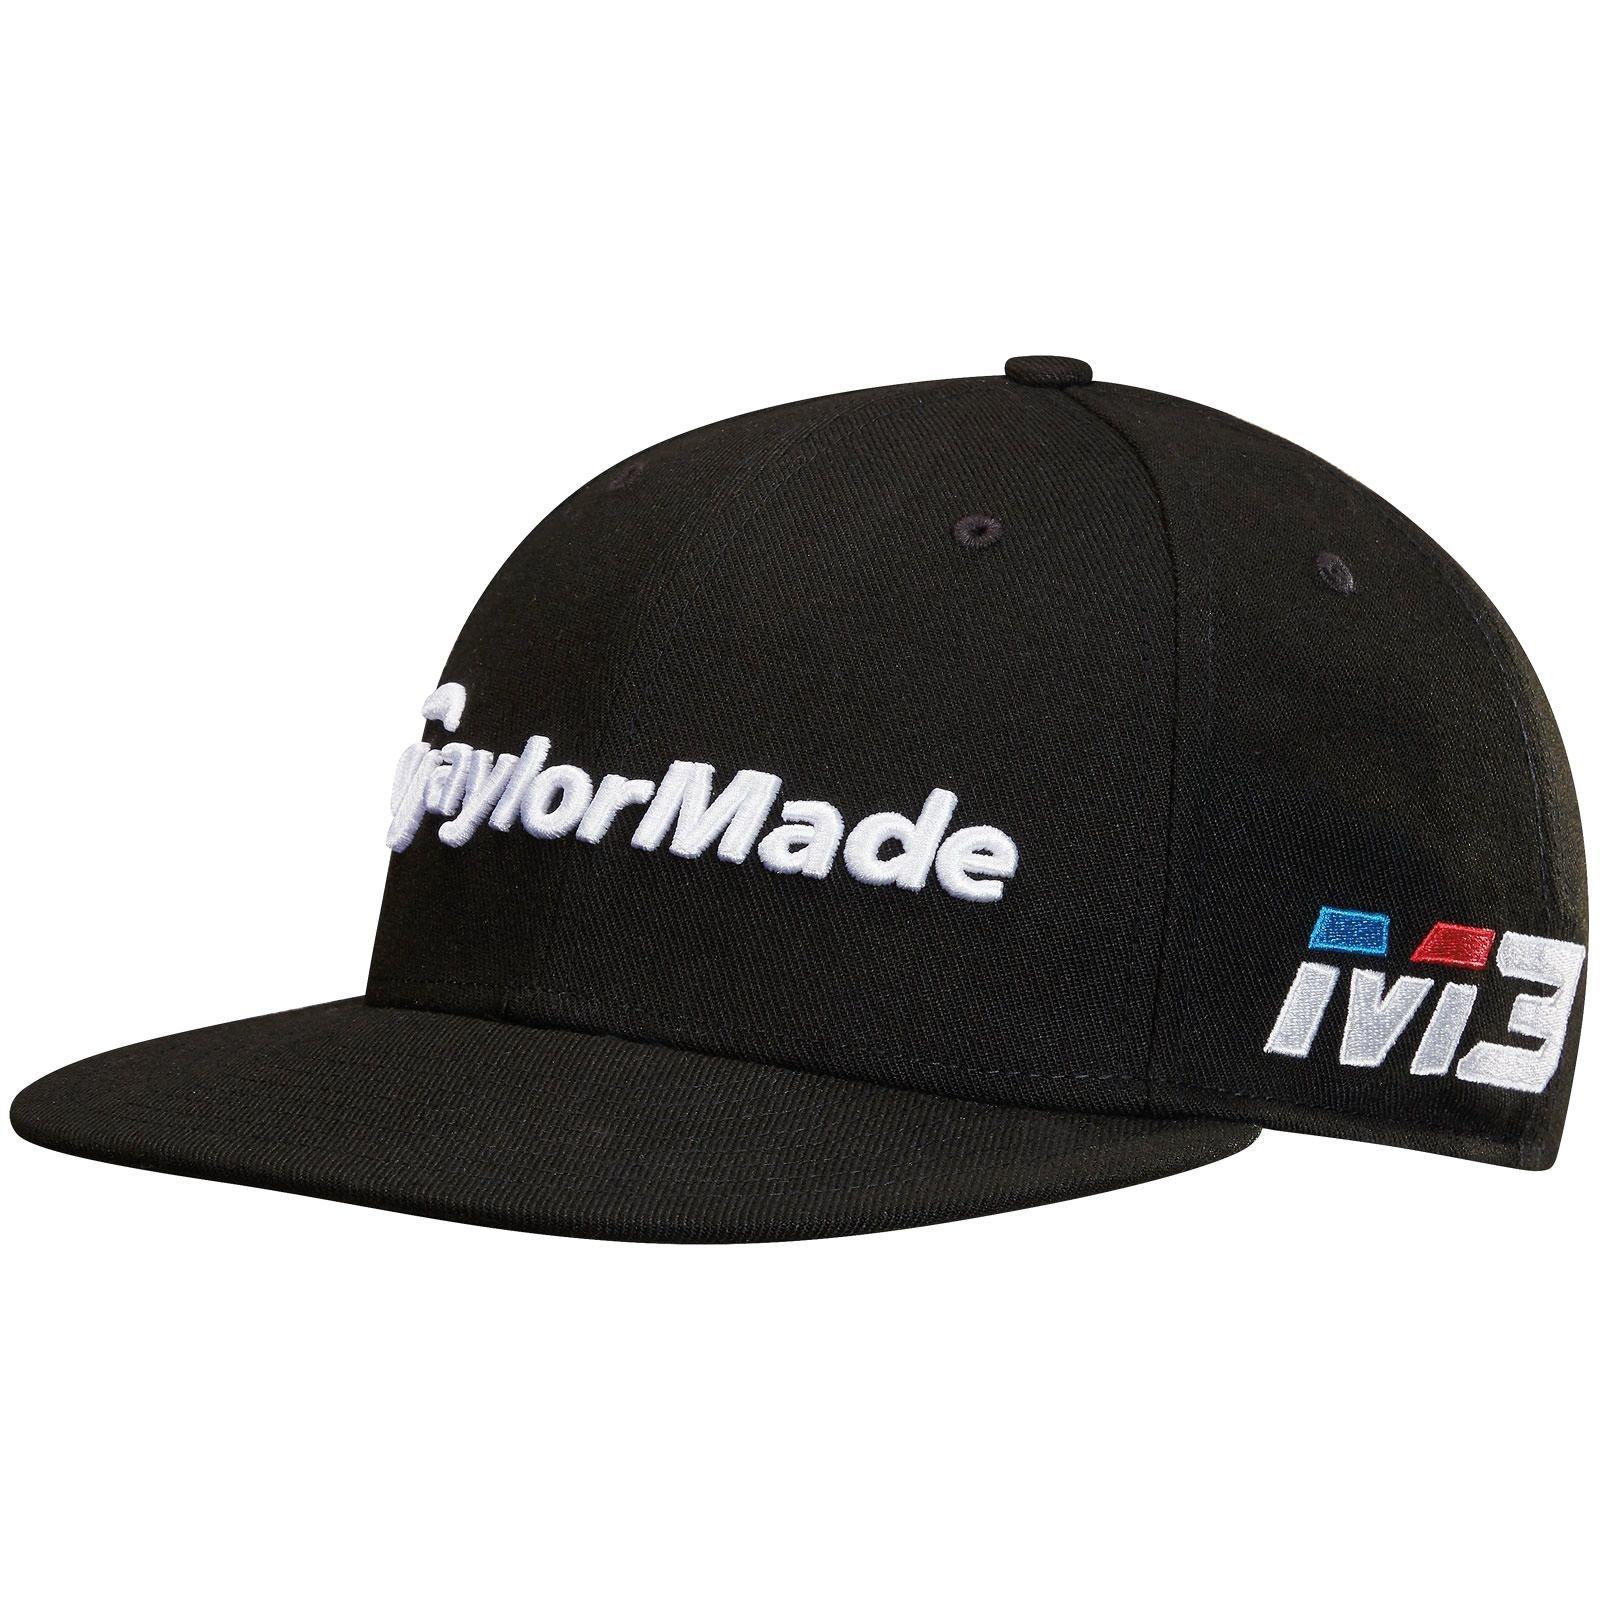 TaylorMade 2018 New Era Tour 9Fifty Hat Adjustable Mens Snapback Golf Cap